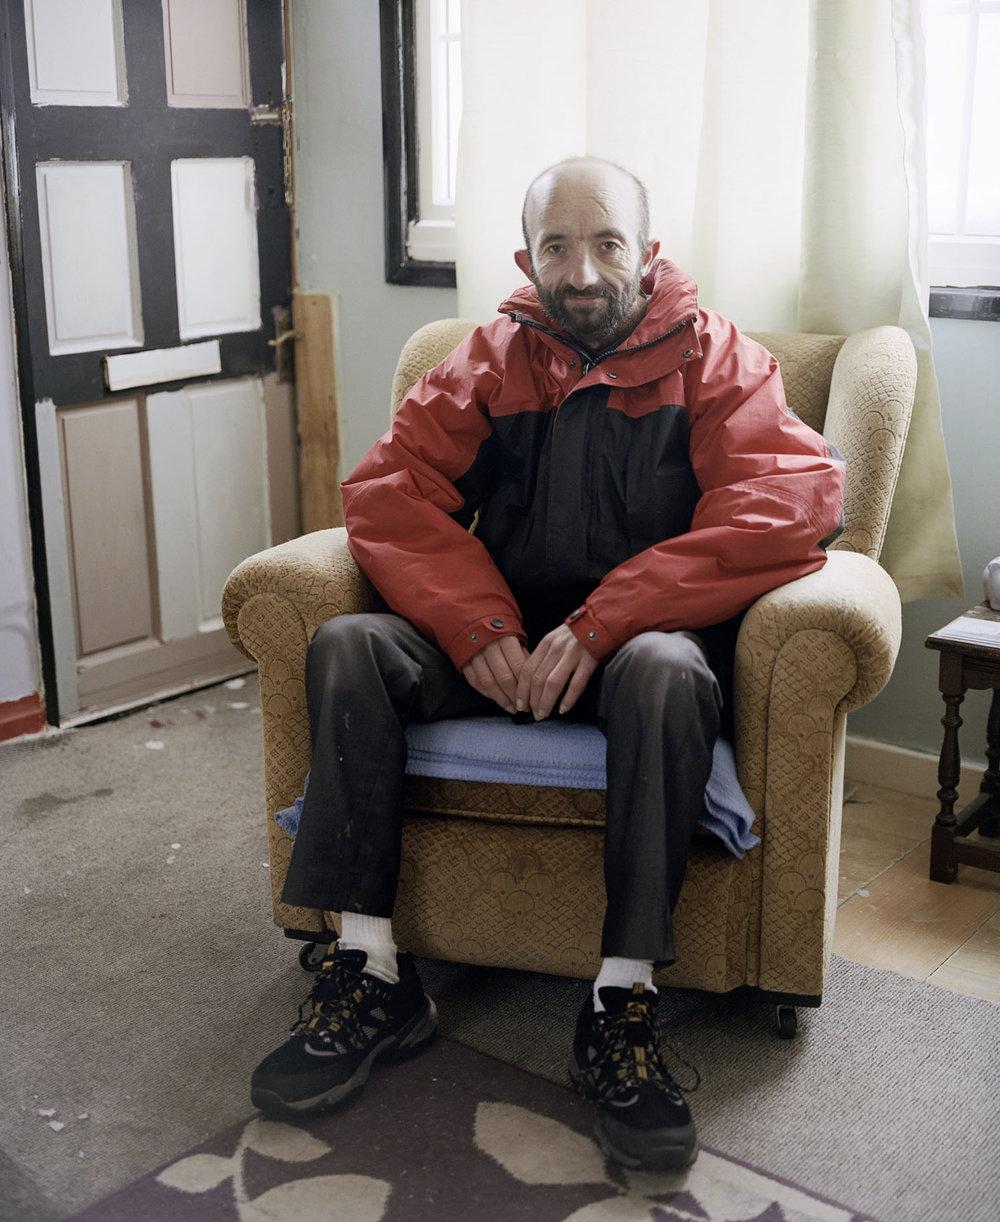 Sandra Mickiewicz Happy Club Man sat in chair in run down home